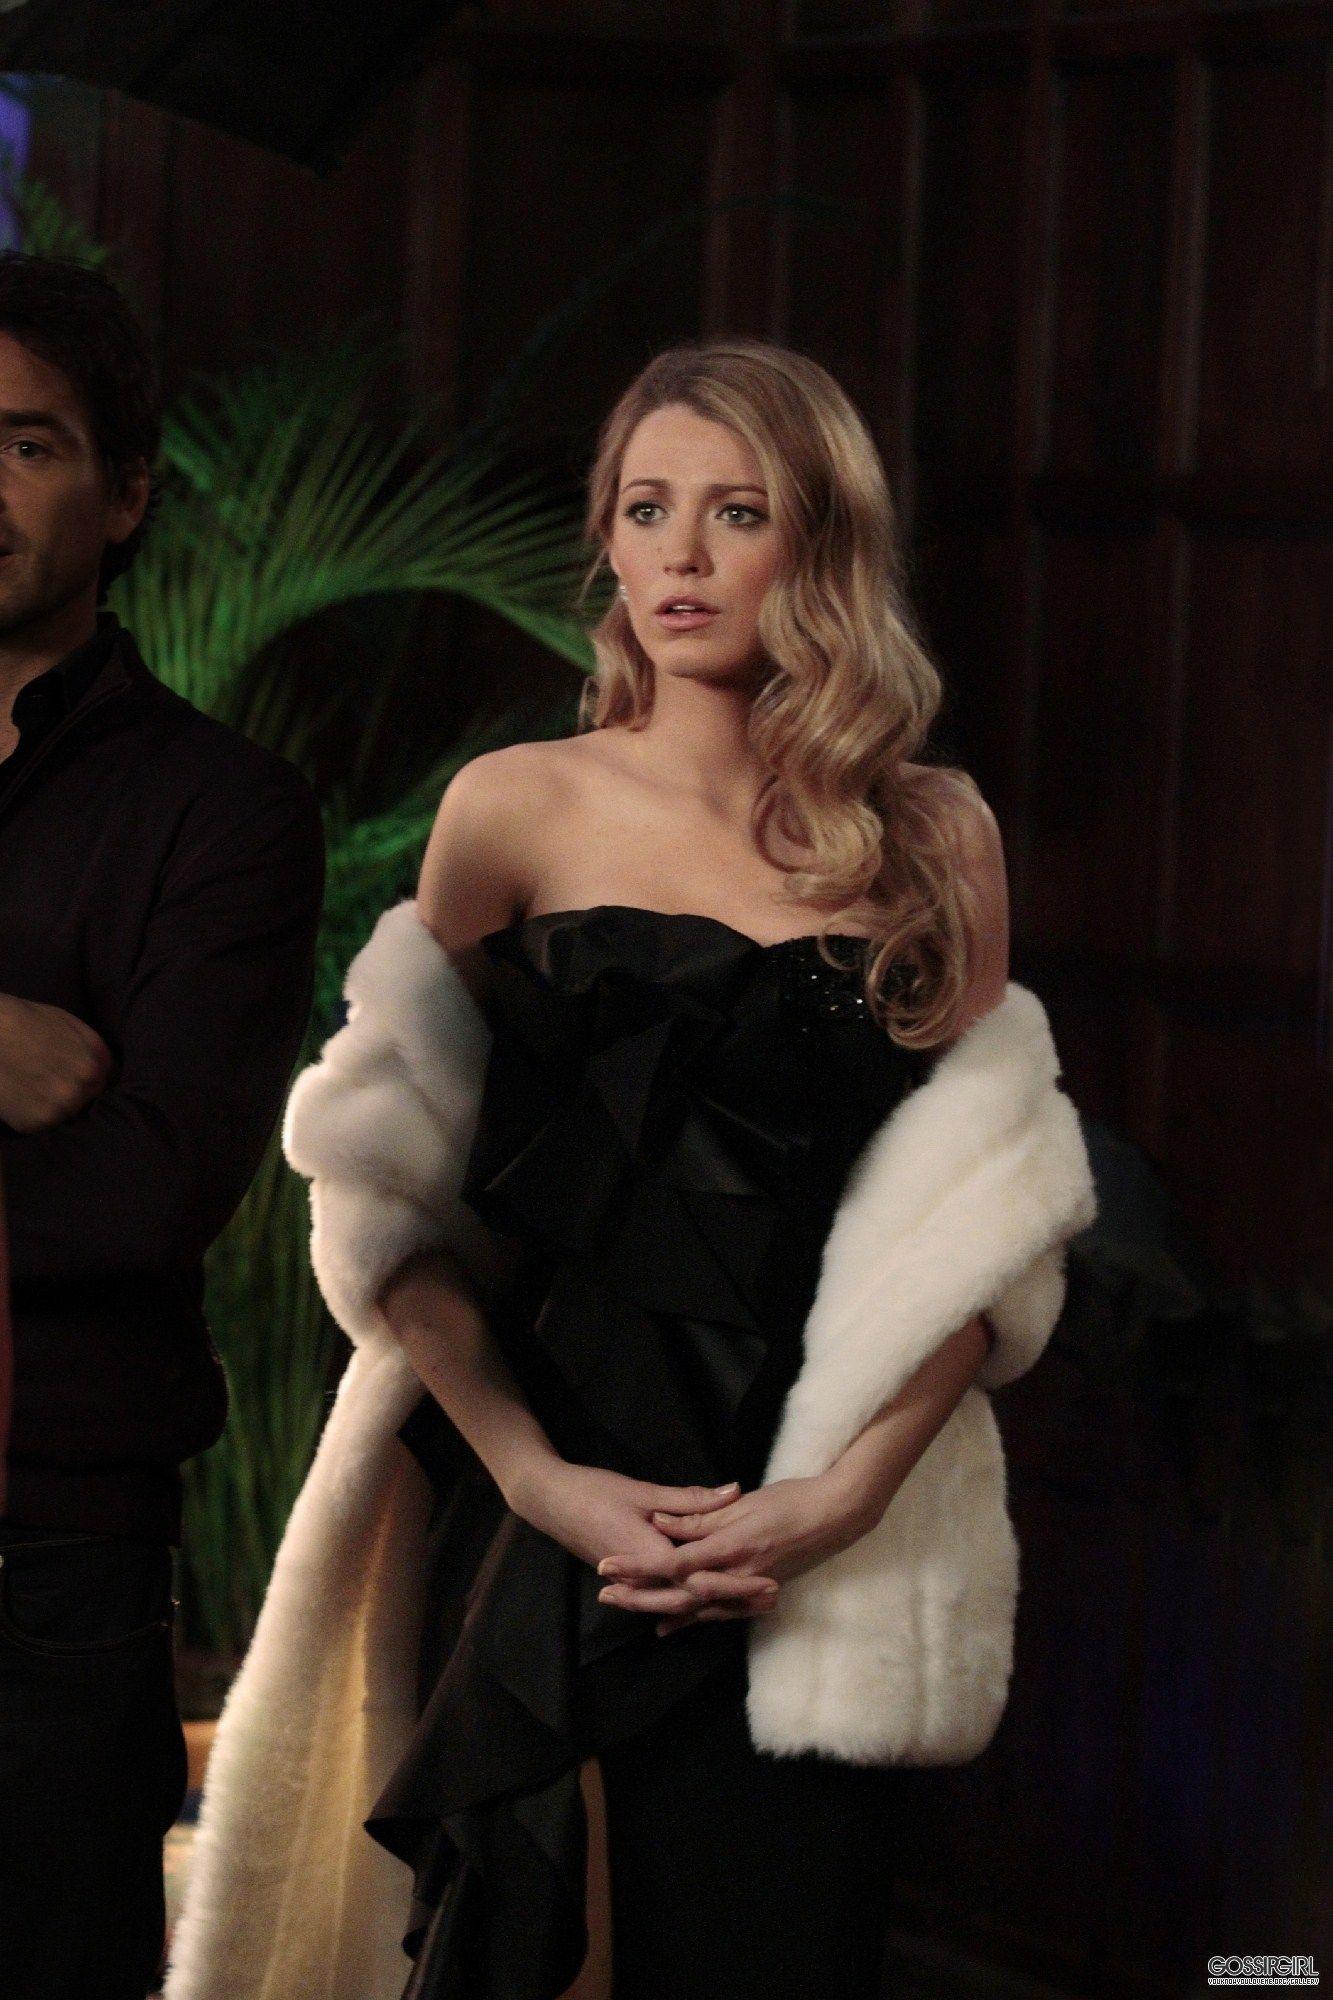 Blake Lively As Serena Van Der Woodsen In Gossip Girl Upper East